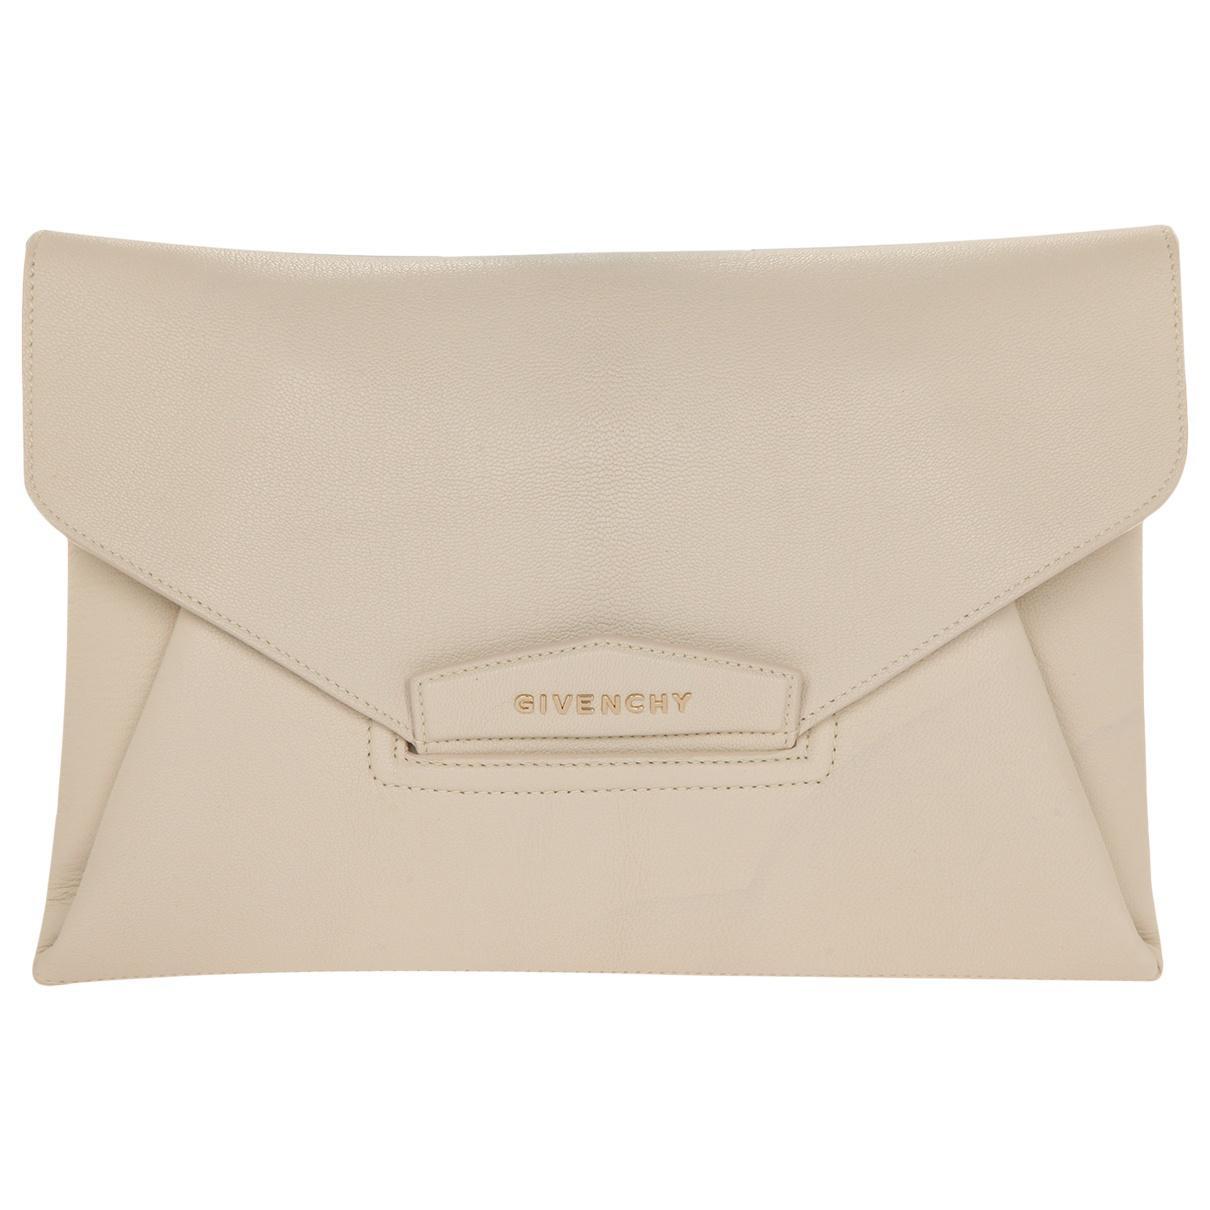 Givenchy Pre-owned - Antigona leather clutch bag nYimb